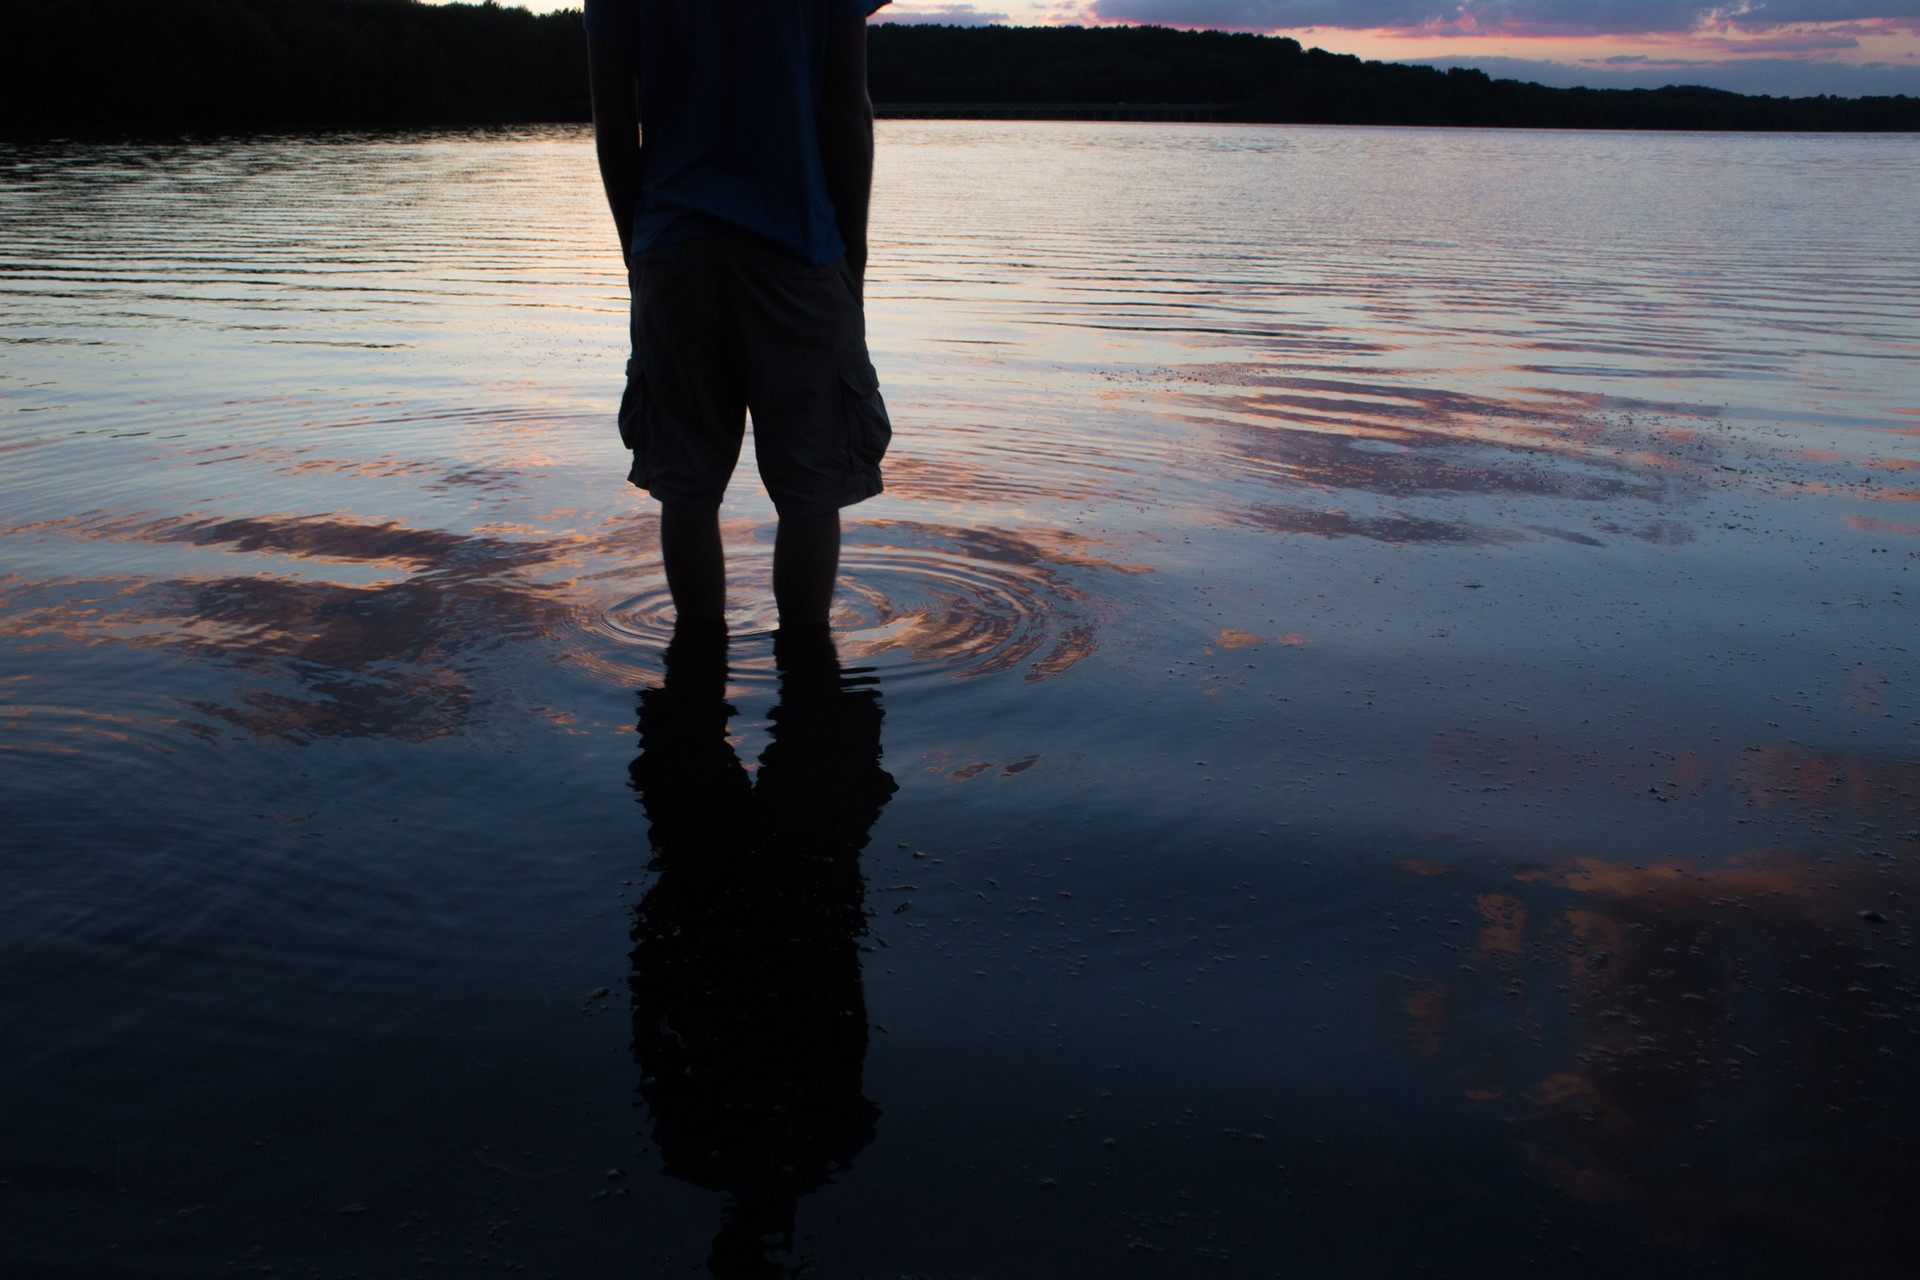 sunset-ripples_25873937540_o.jpg